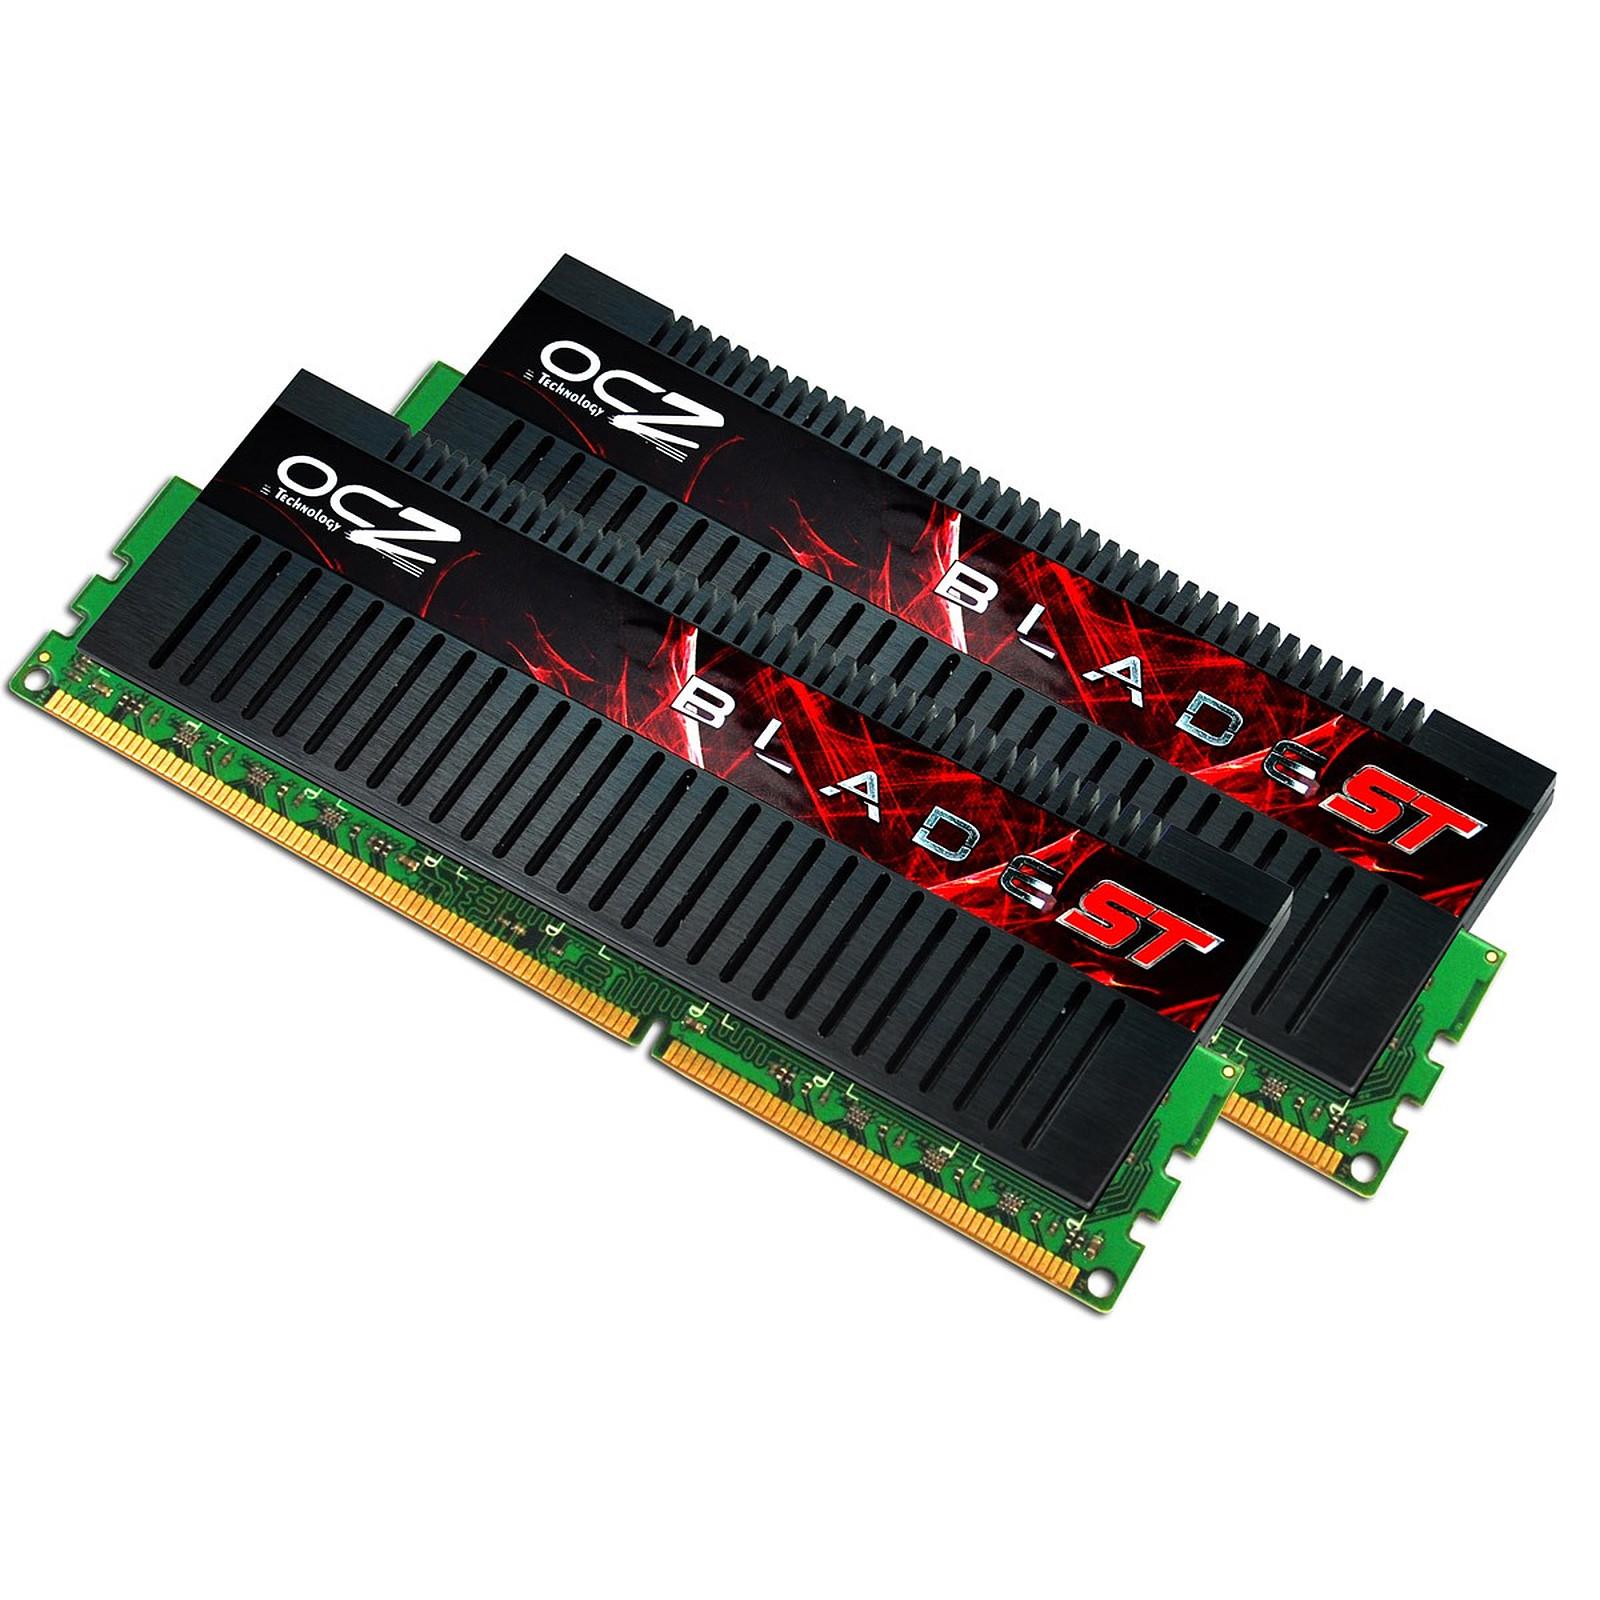 OCZ Blade ST Edition 8 Go (2x 4Go) DDR3 1600 MHz